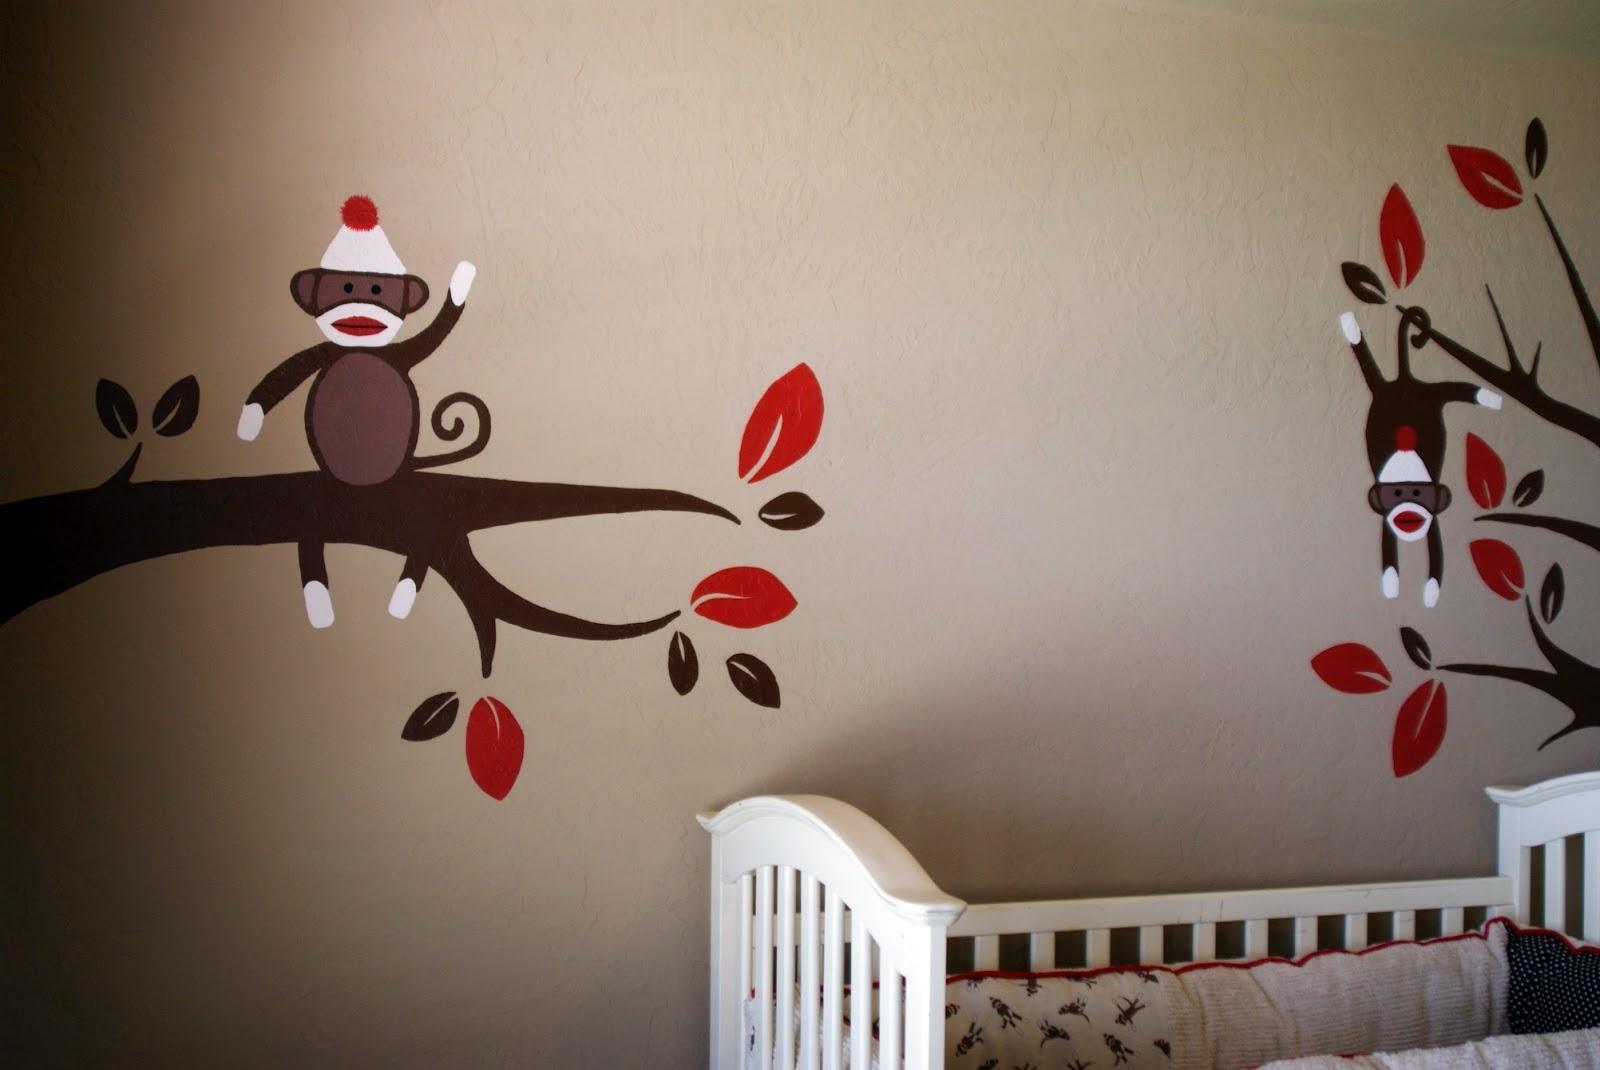 Sock Monkey Nursery Ideas — Modern Home Interiors Within Sock Monkey Wall Art (View 2 of 20)